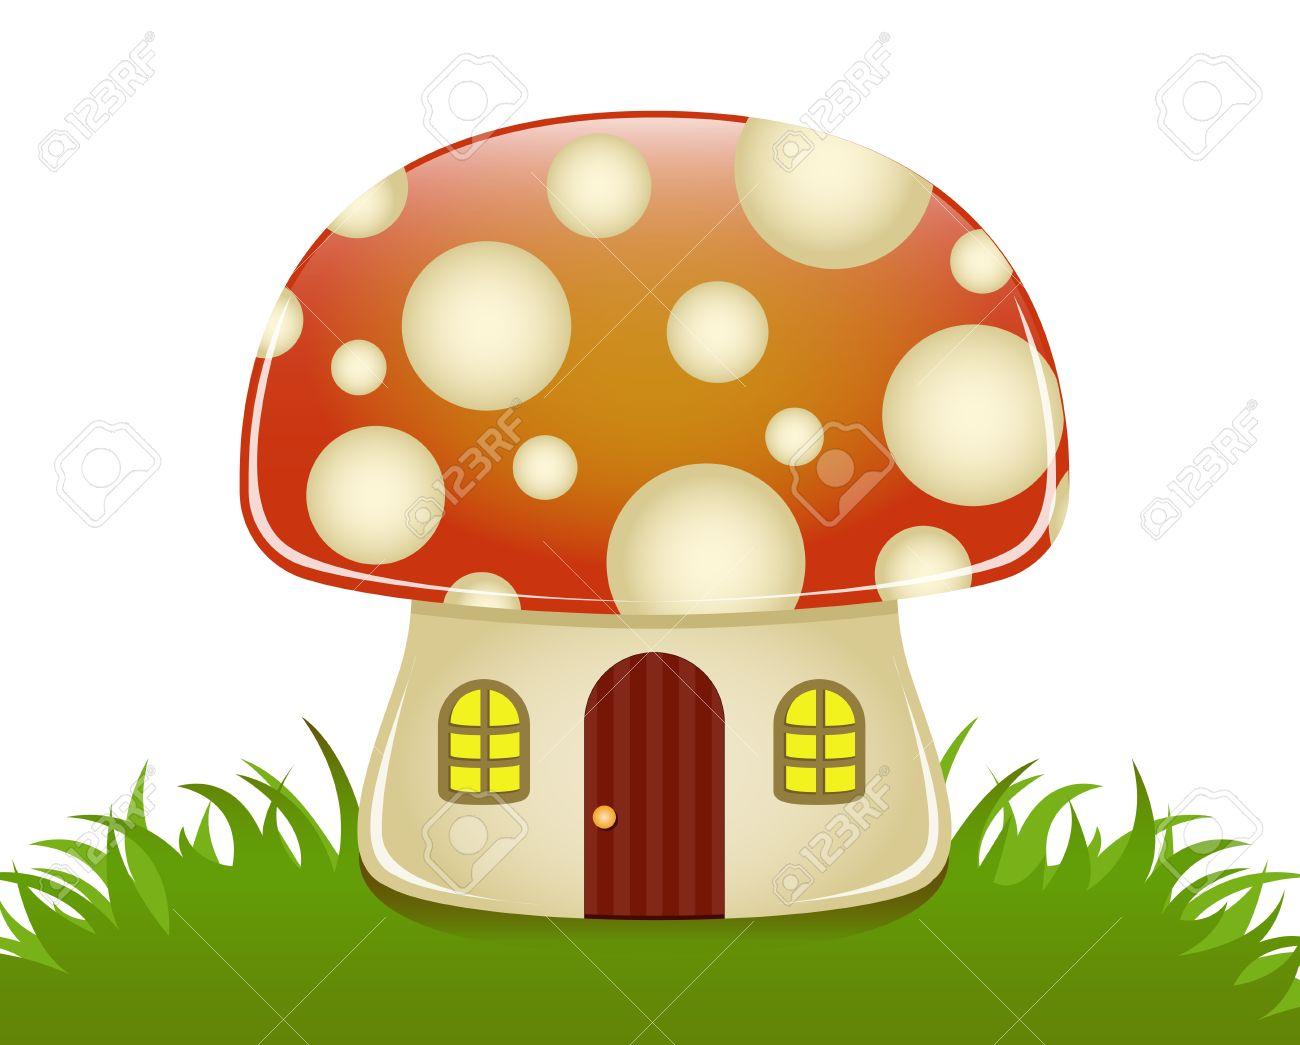 Glossy Illustration Of A Small Mushroom House Royalty Free.